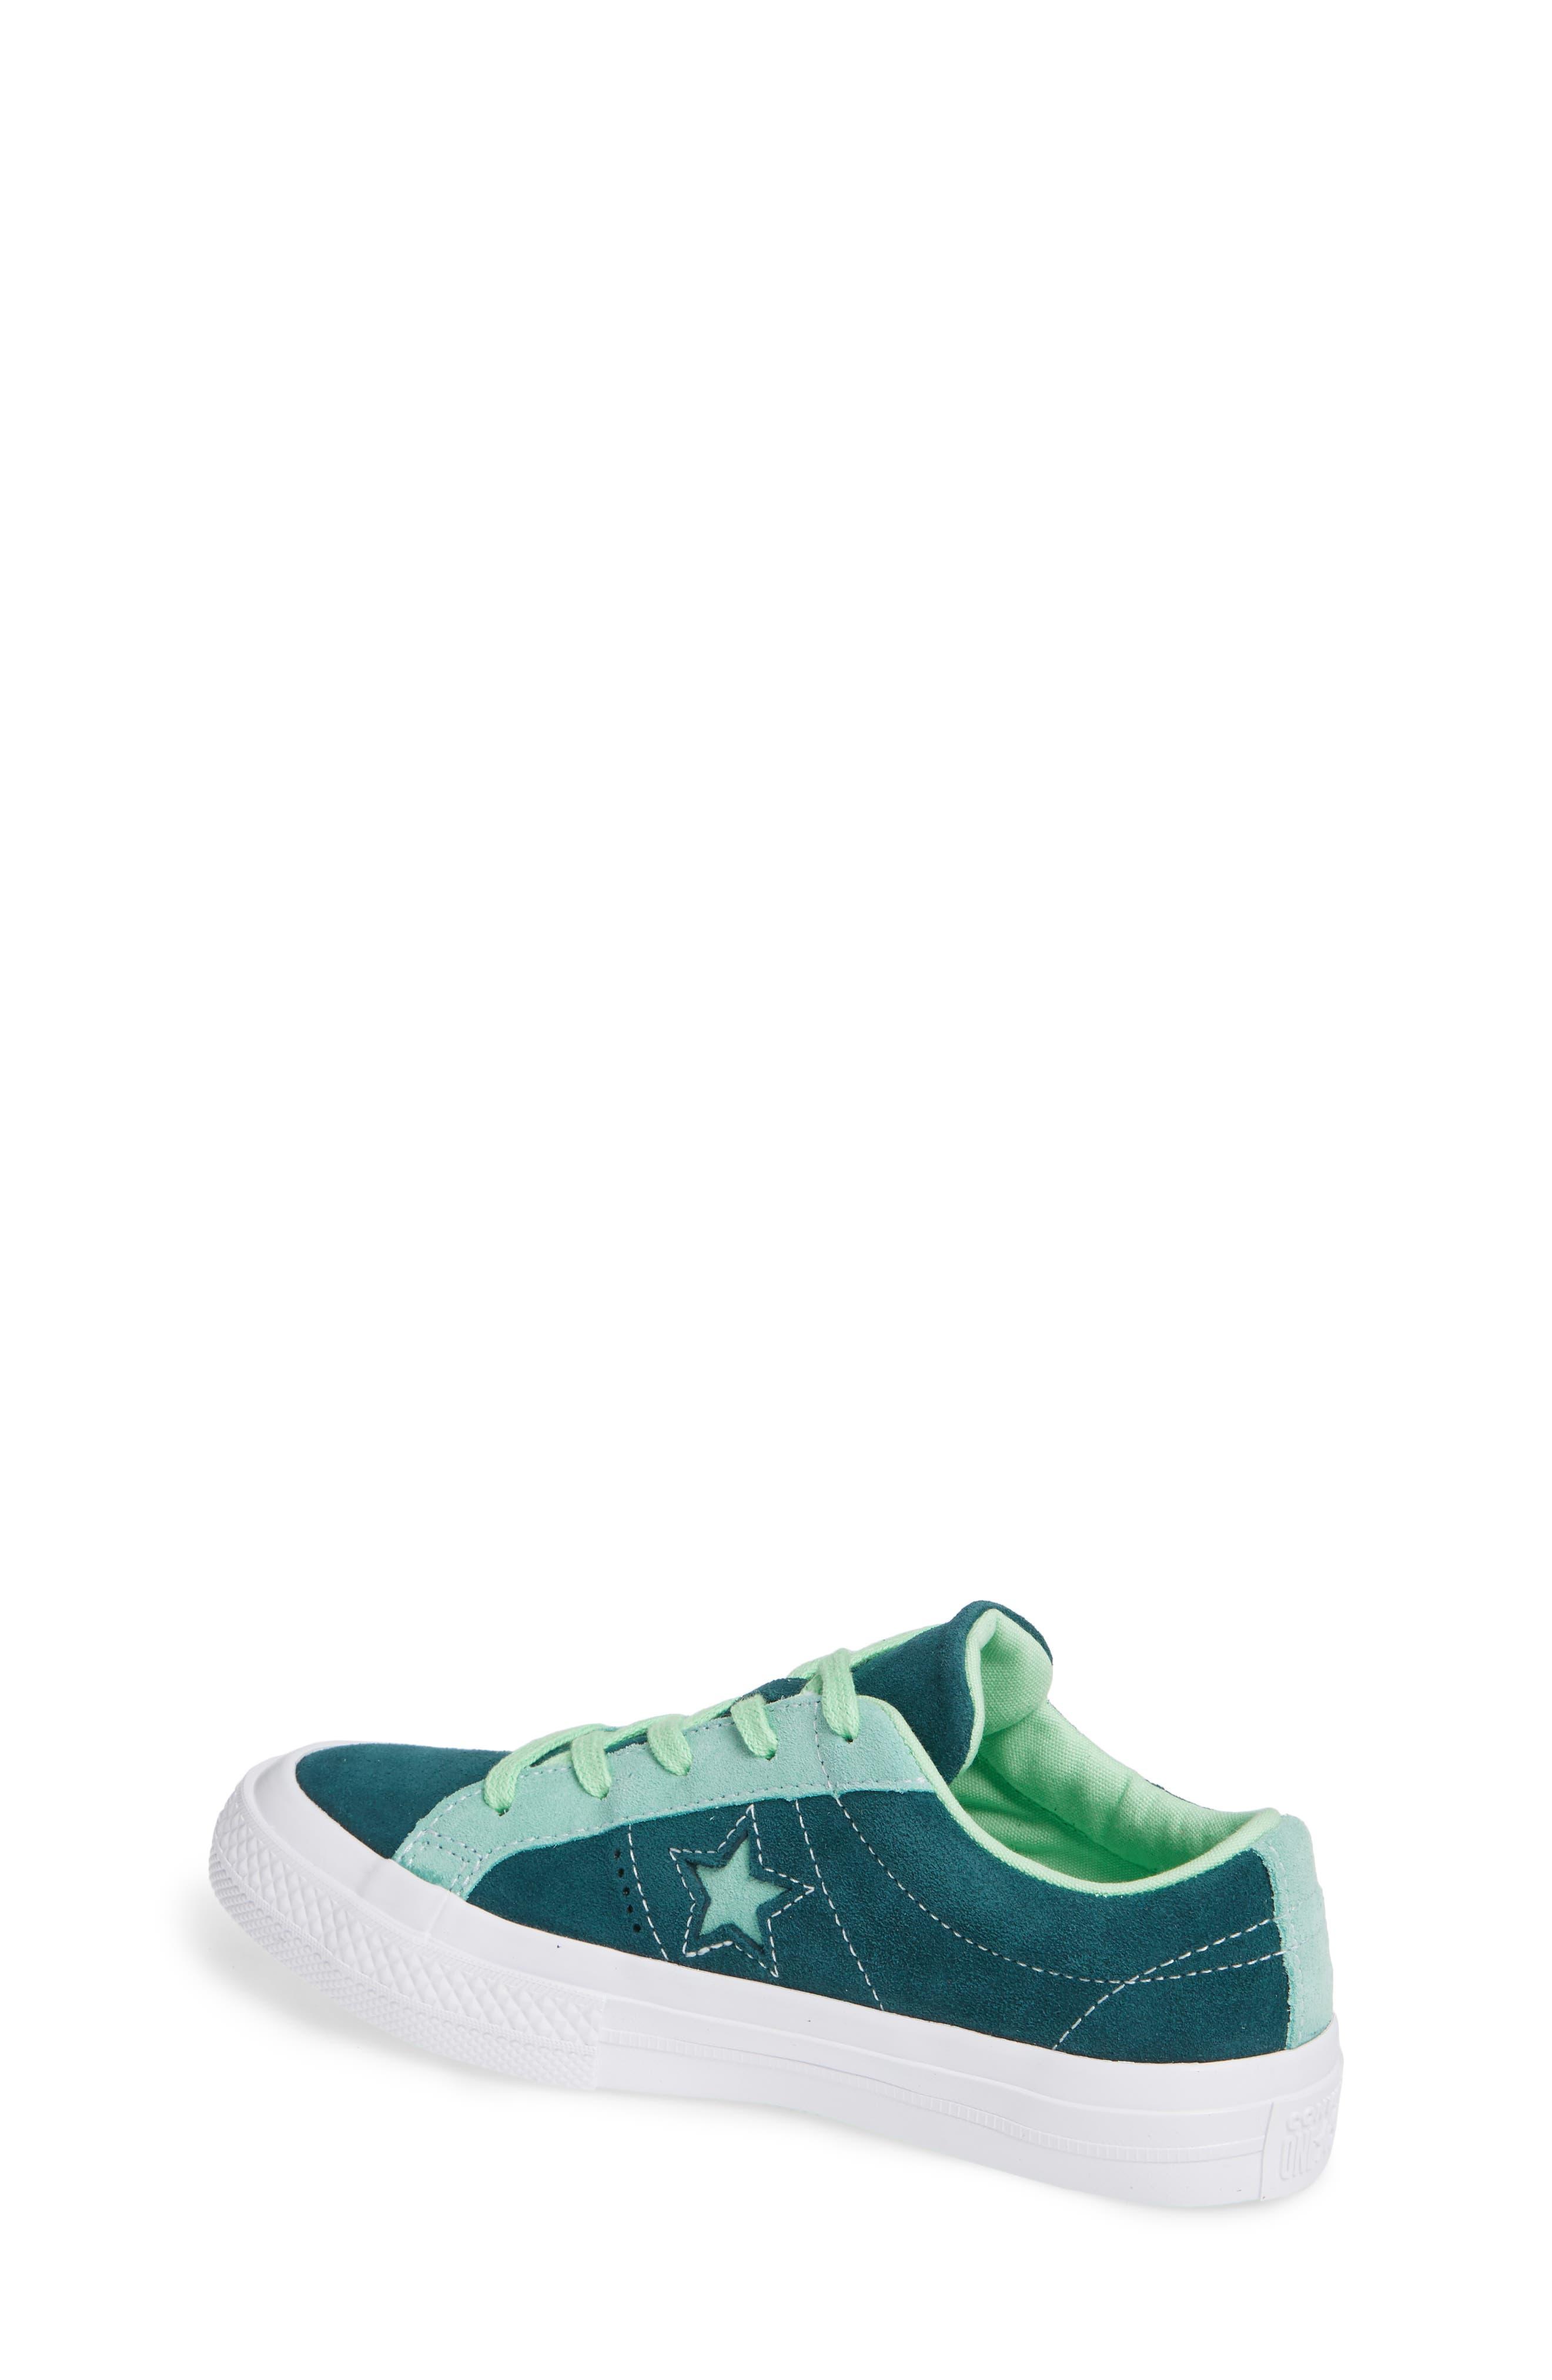 One Star Carnival Low Top Sneaker,                             Alternate thumbnail 2, color,                             345